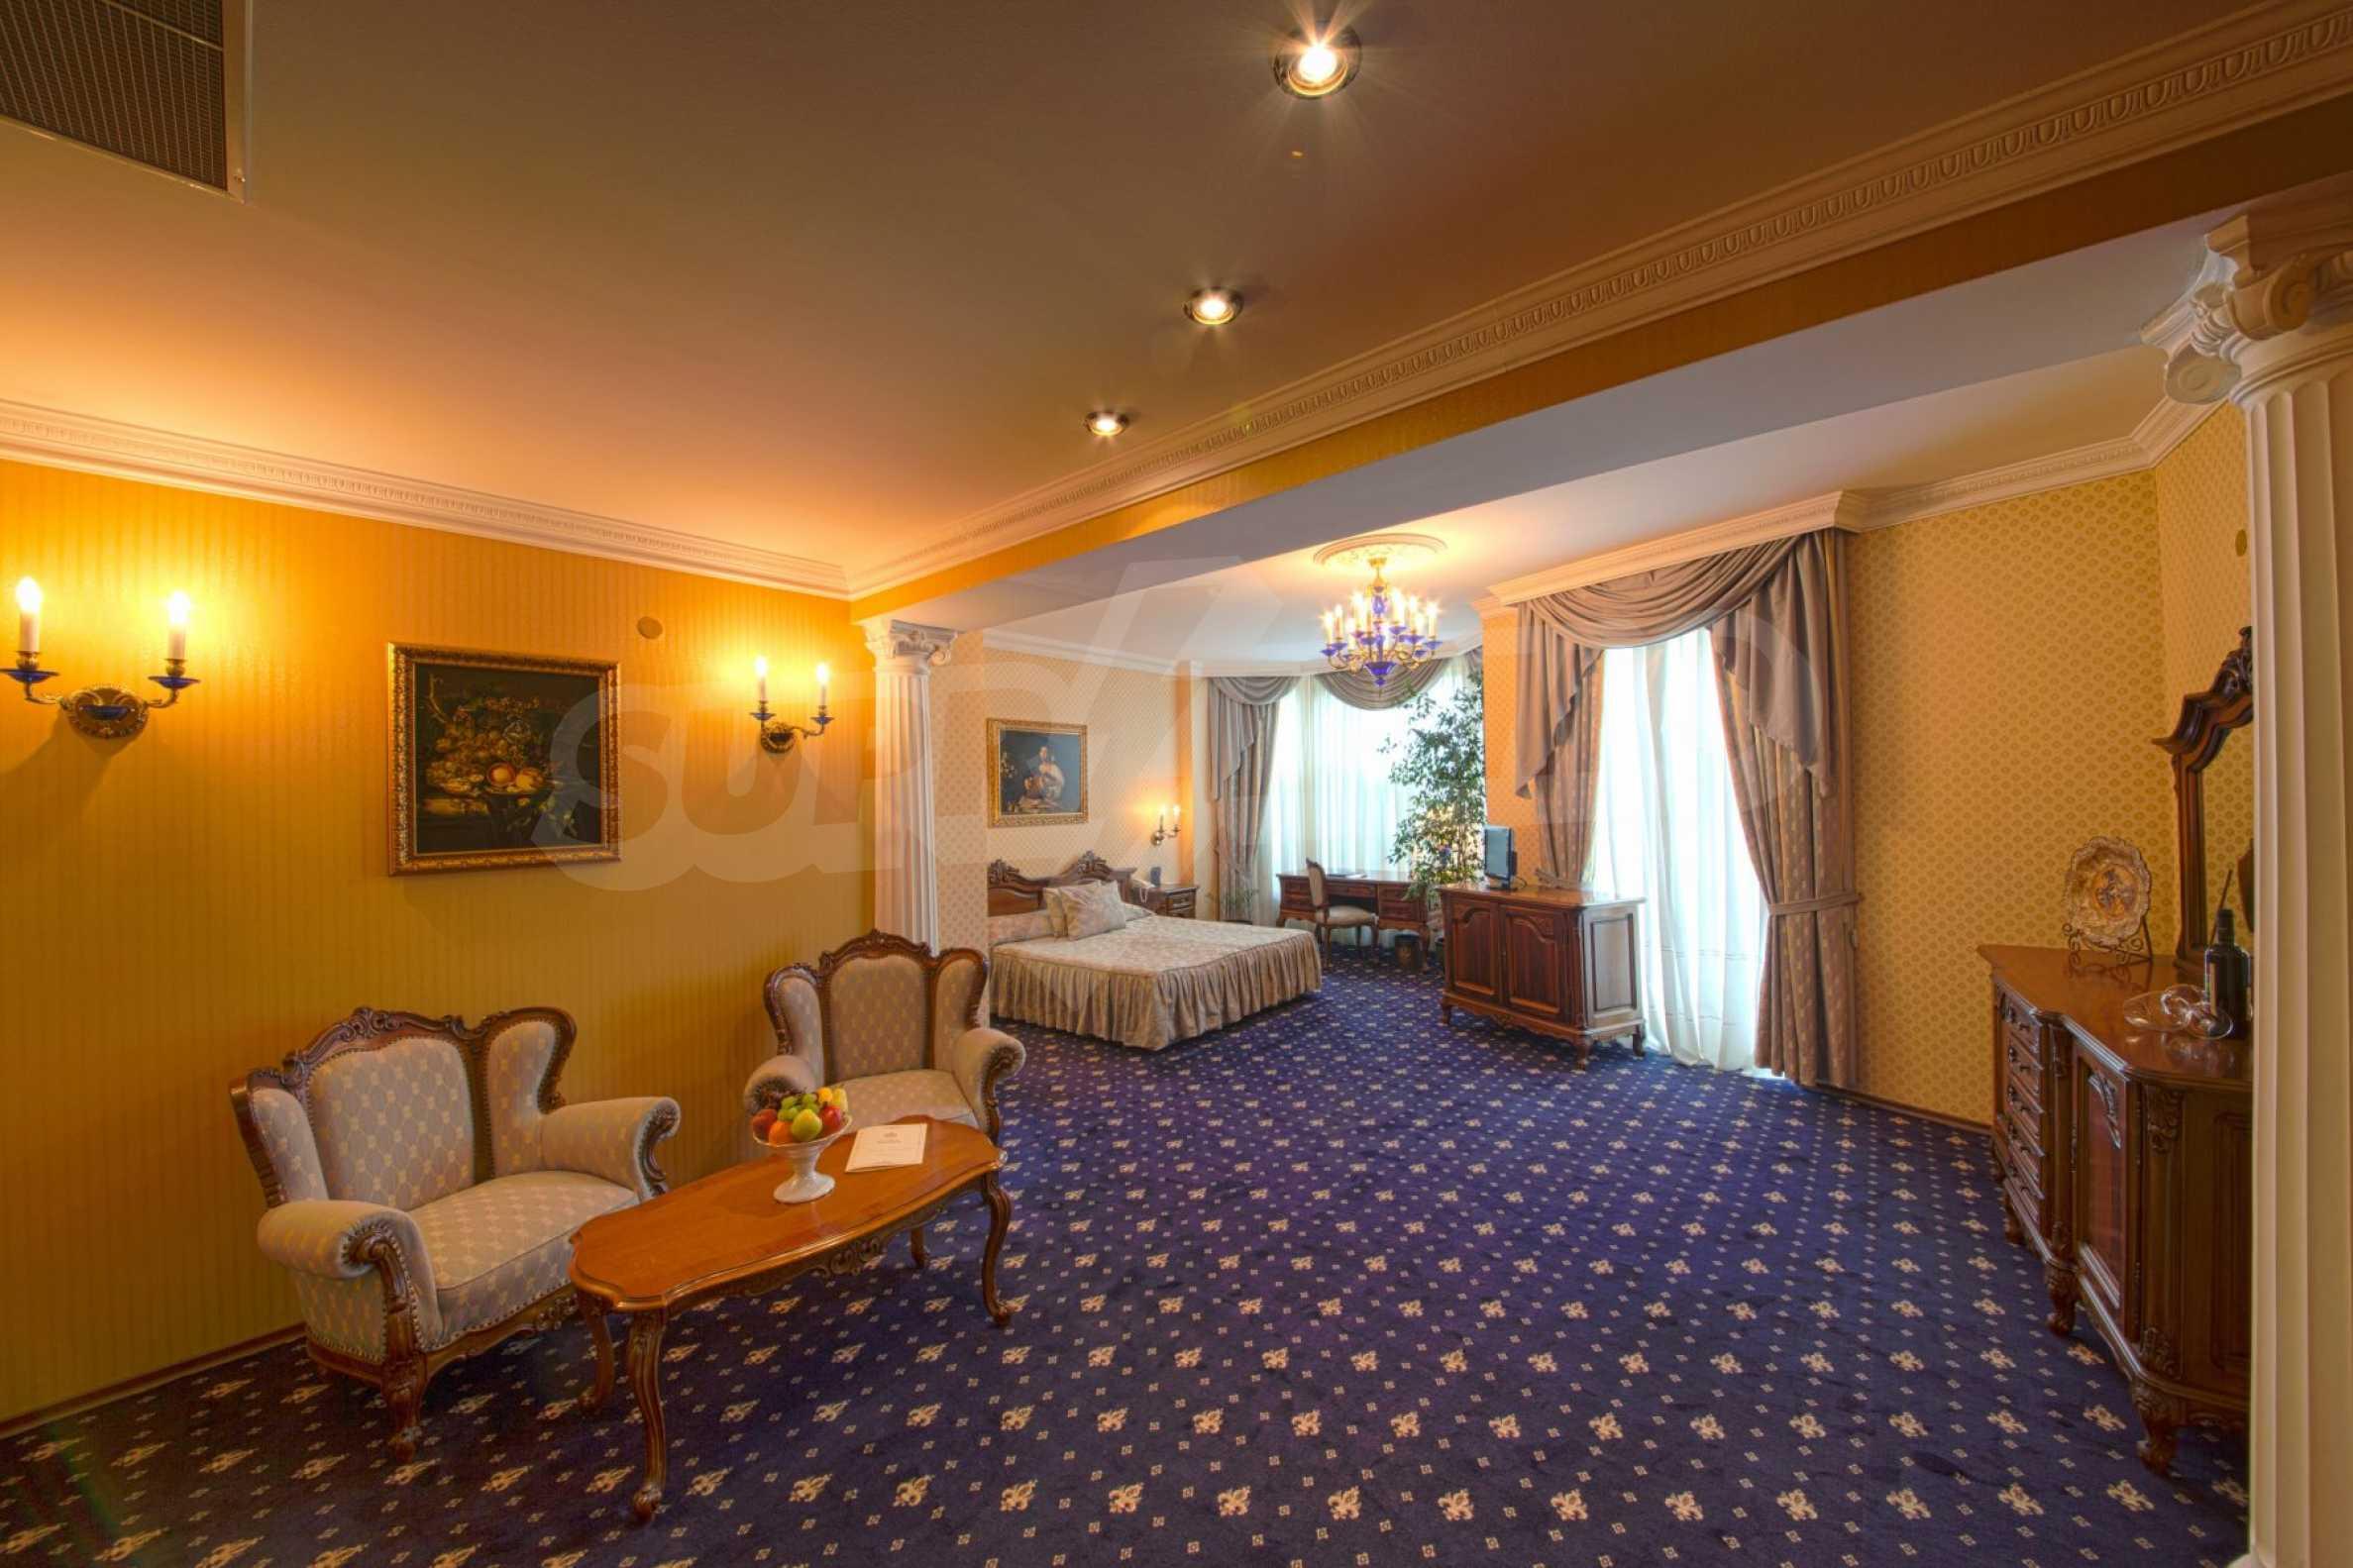 Fünf-Sterne-Hotel 12